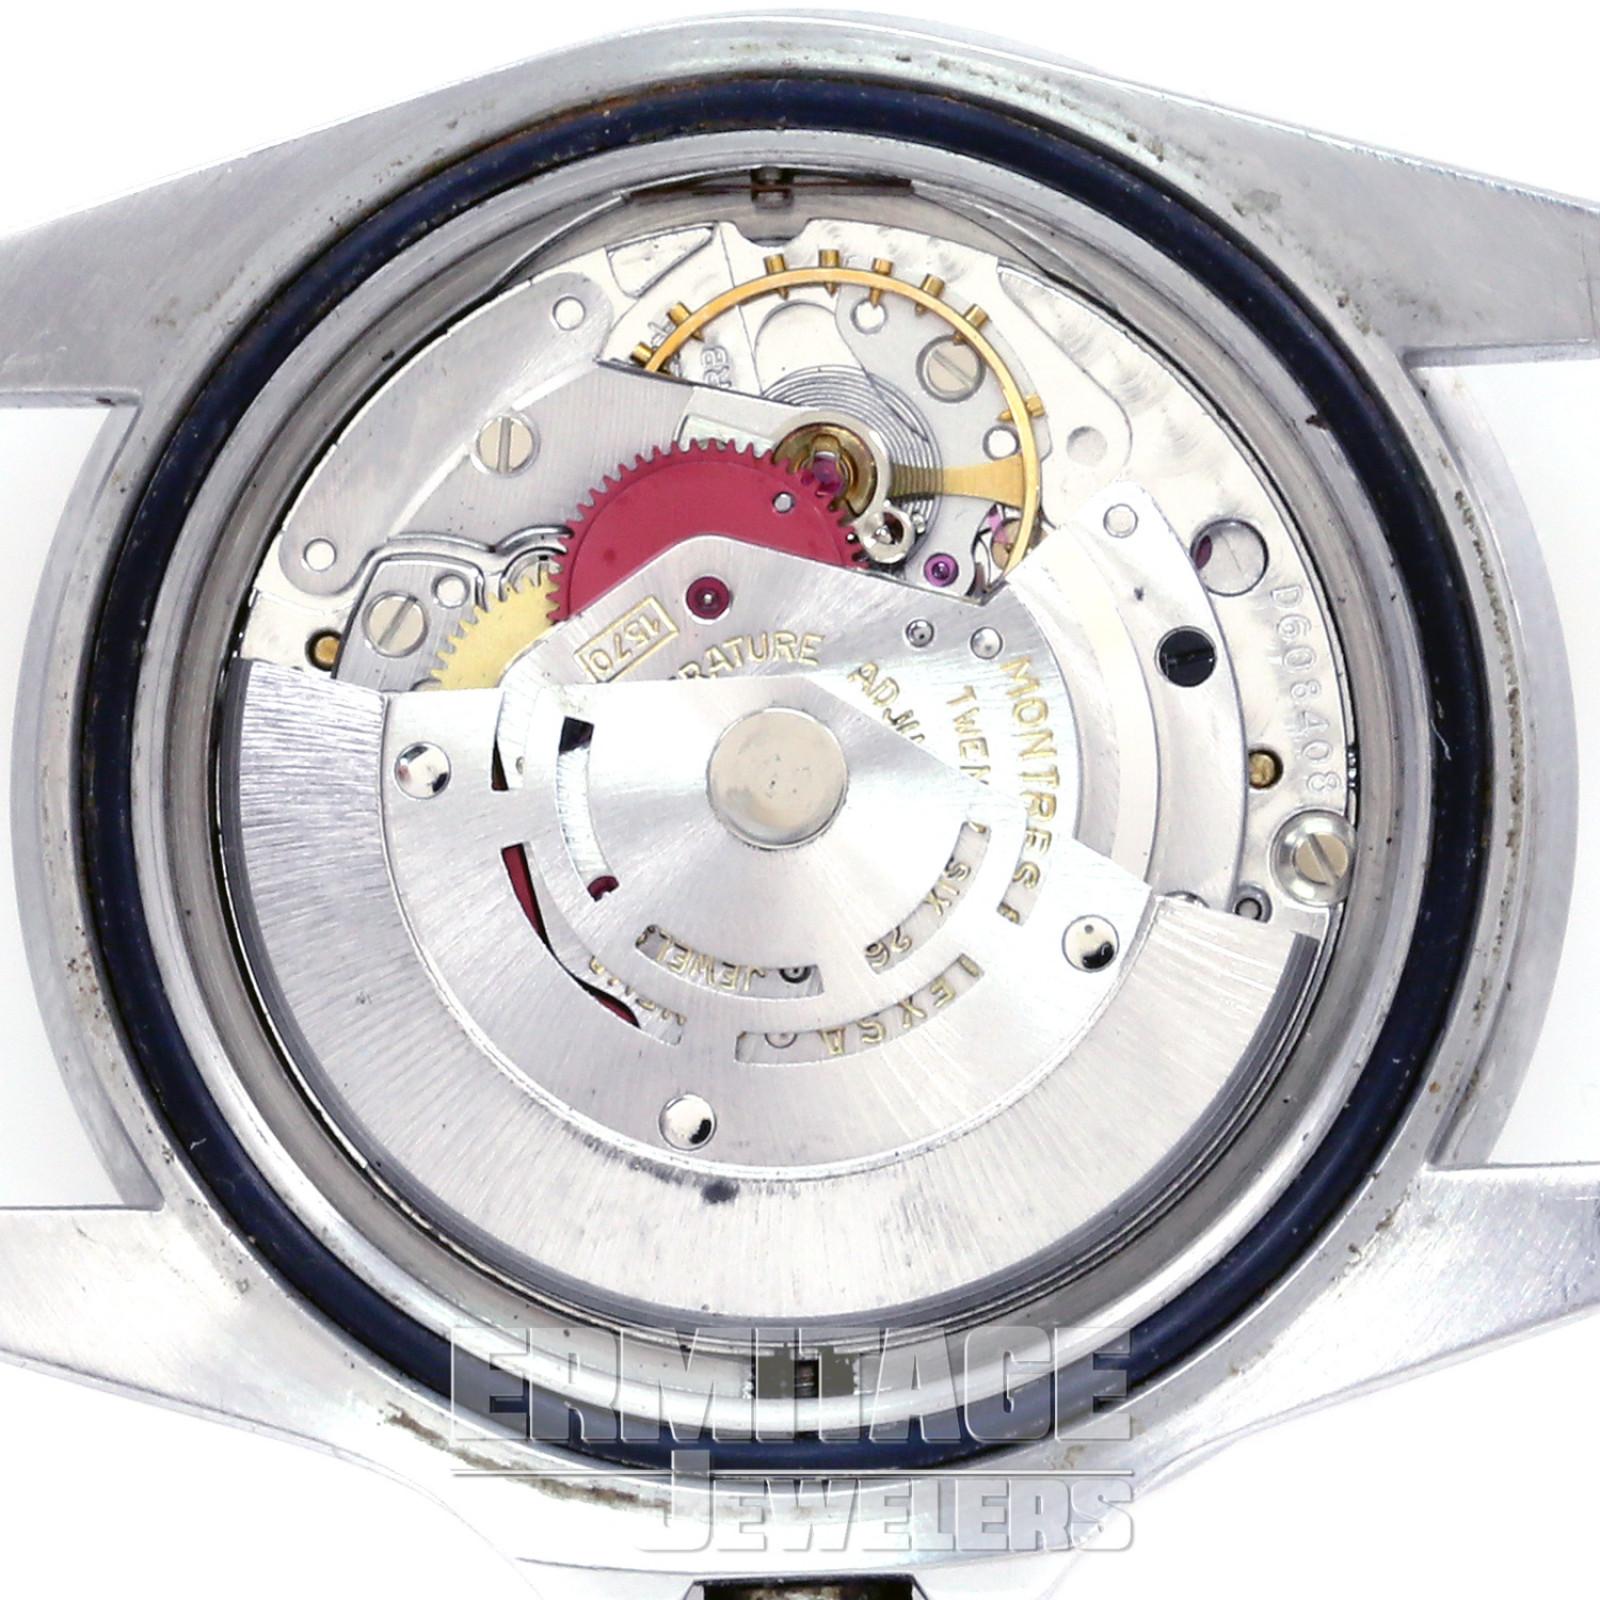 Double Red Mark IV Rolex Sea Dweller 1665 Luminous